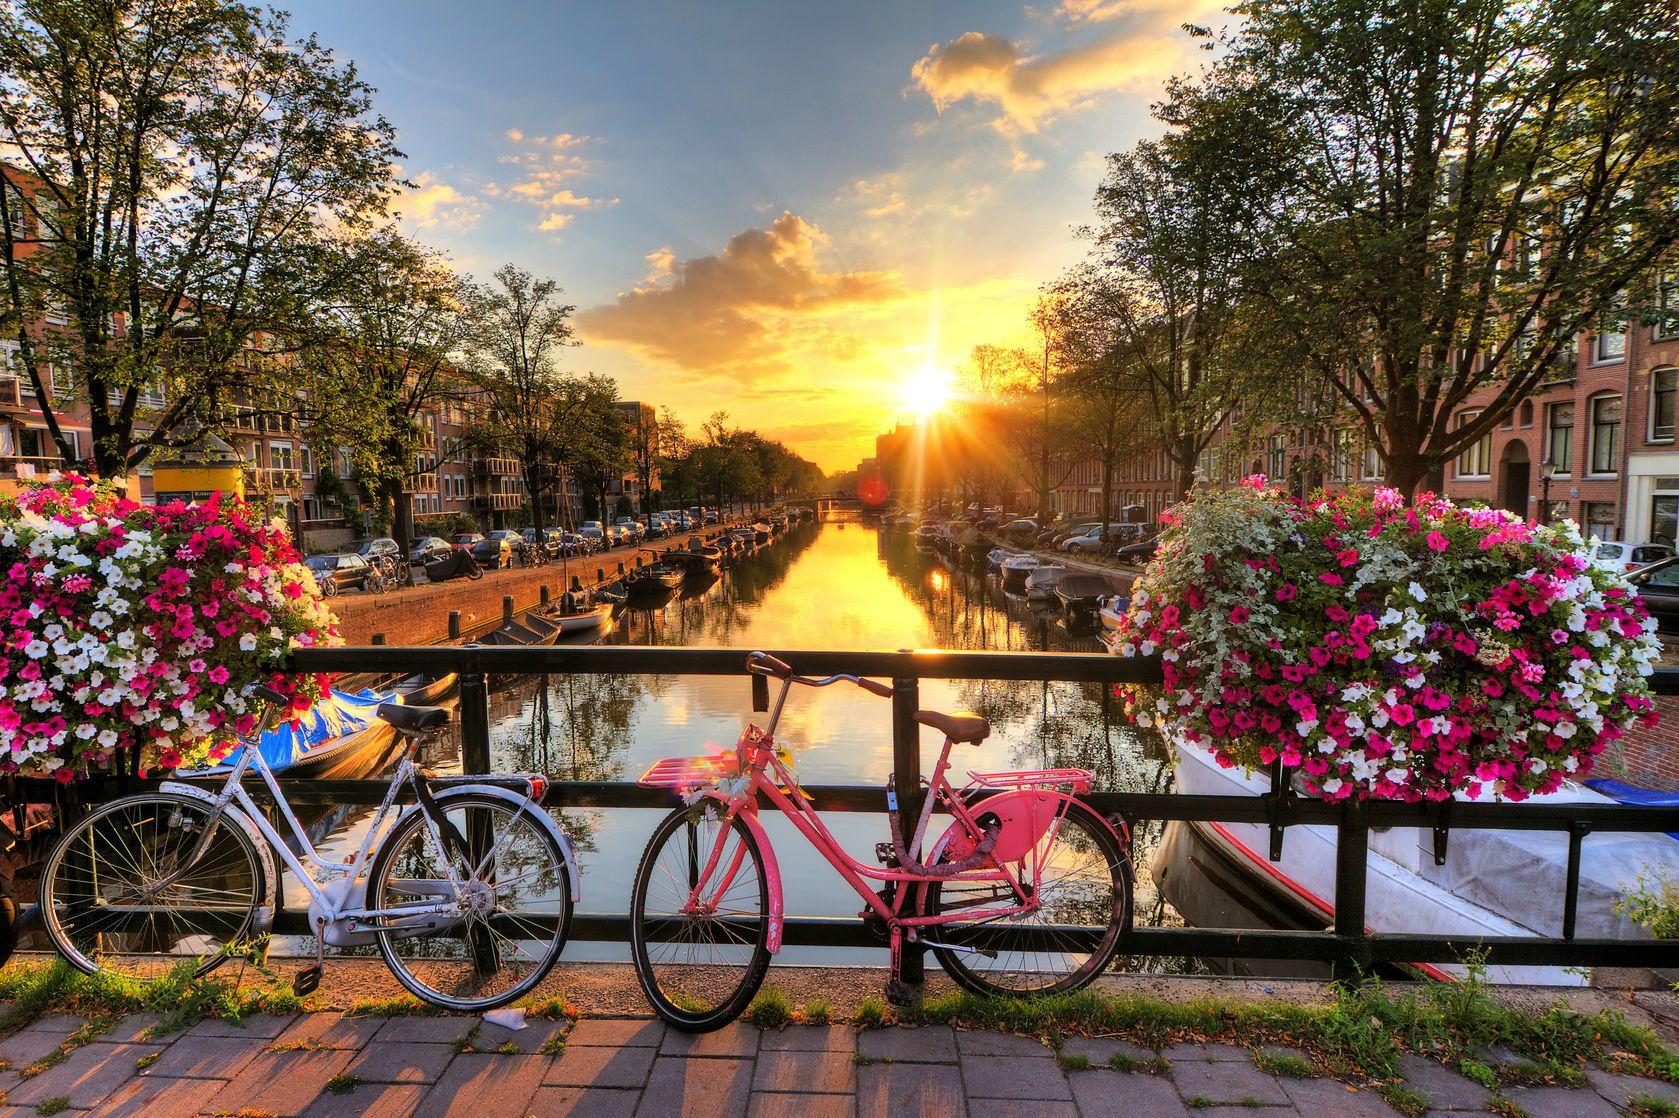 Východ slunce nad Amsterdamem | dennisvdwater/123RF.com